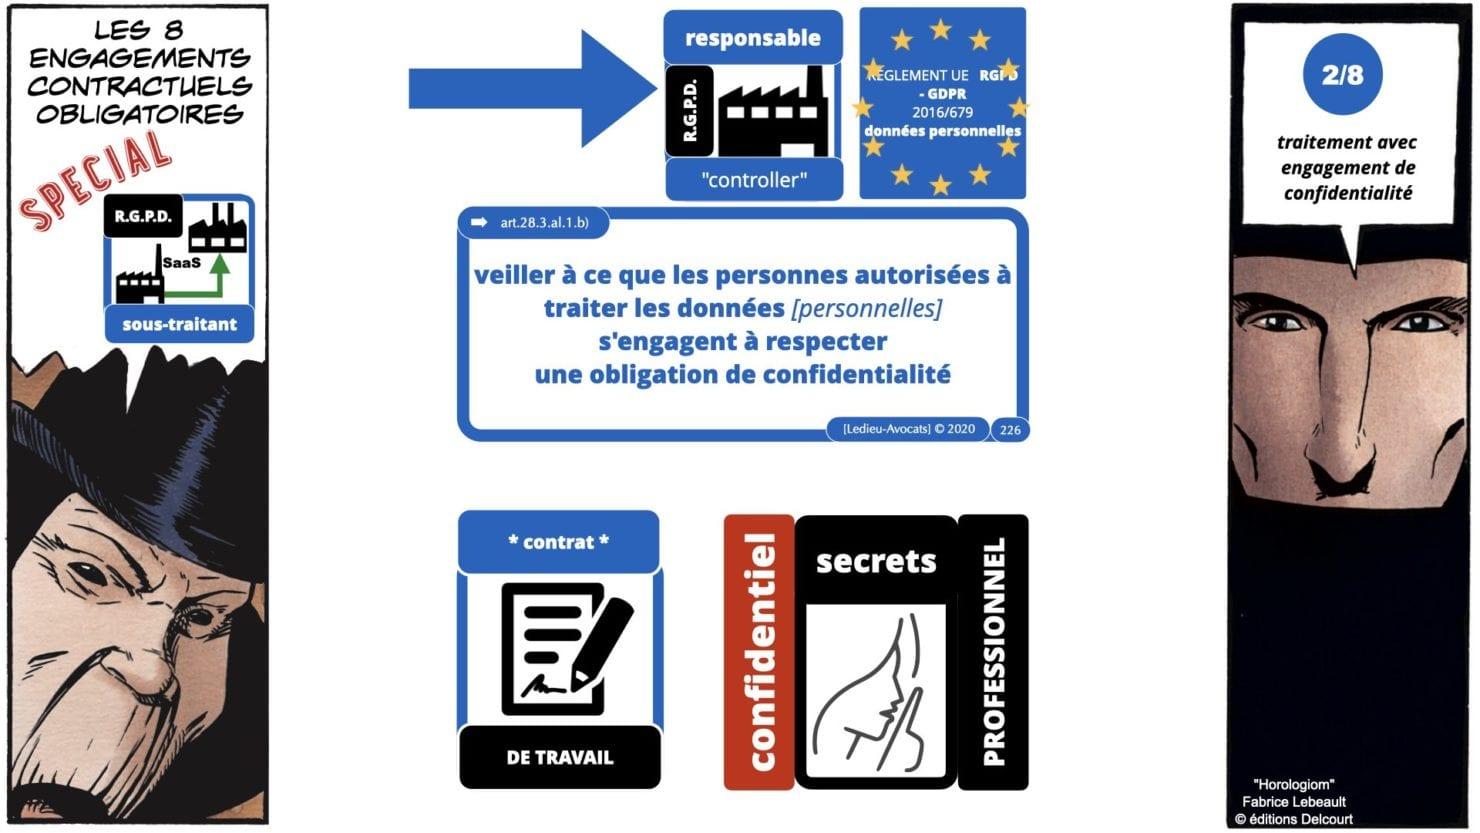 RGPD e-Privacy principes actualité jurisprudence ©Ledieu-Avocats 25-06-2021.226